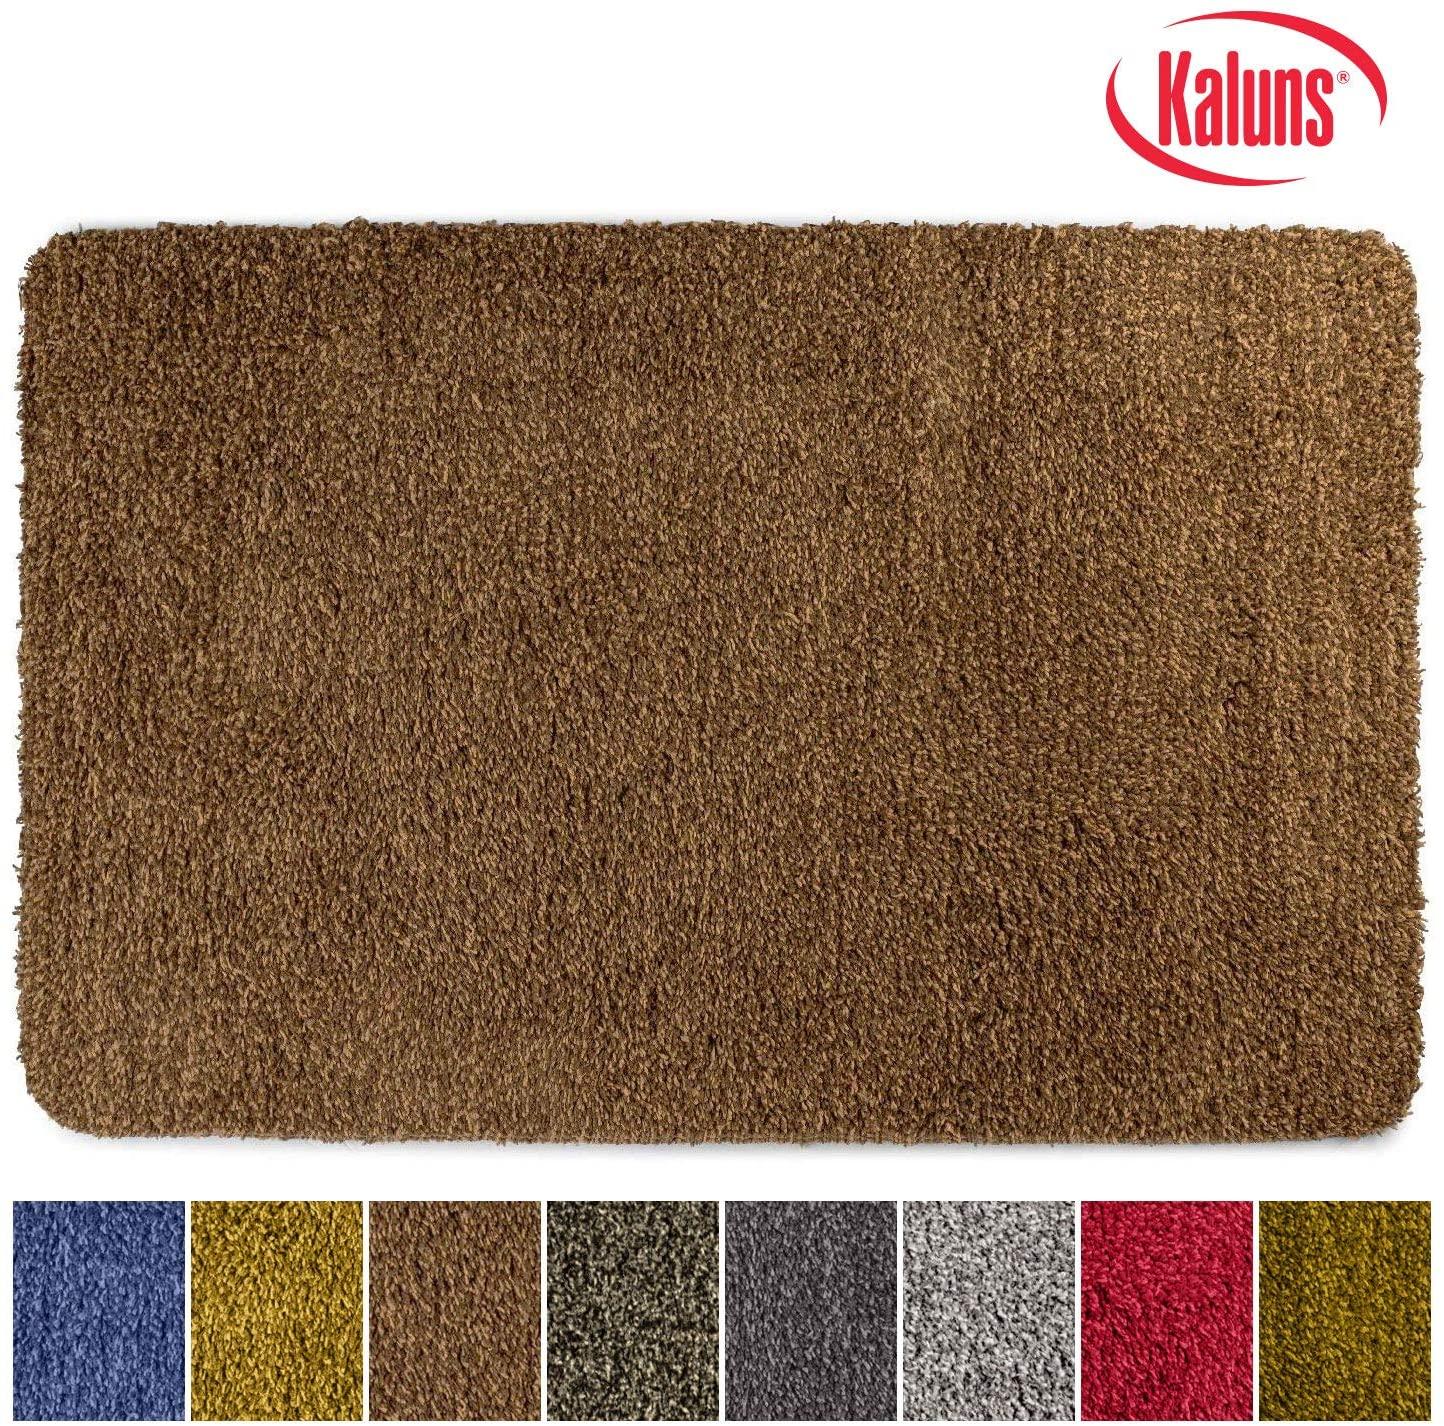 Kaluns Door Mat, Front Doormat, Super Absorbent Mud Mats, Doormats for Entrance Way, Entry Rug, Non Slip PVC Waterproof Backing, Shoe Mat for Entryway, Machine Washable (18x28 Brown)